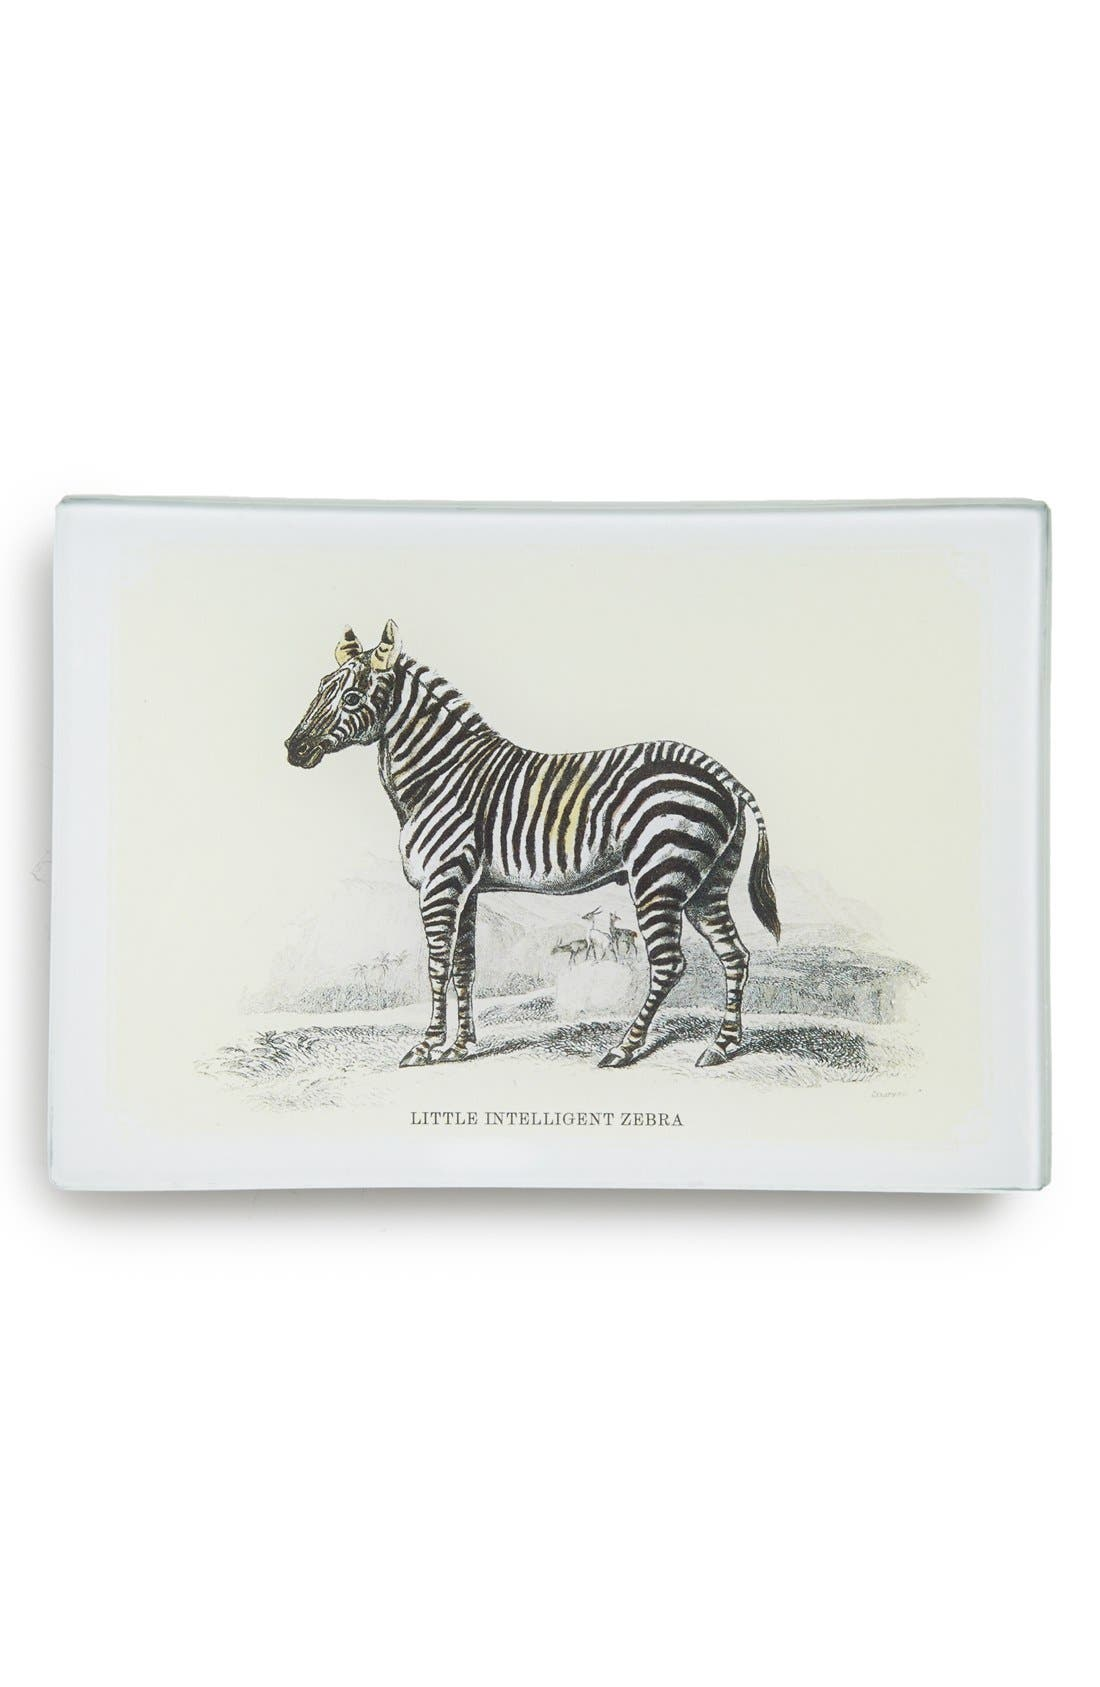 Alternate Image 1 Selected - Ben's Garden 'Little Intelligent Zebra' Decorative Glass Tray